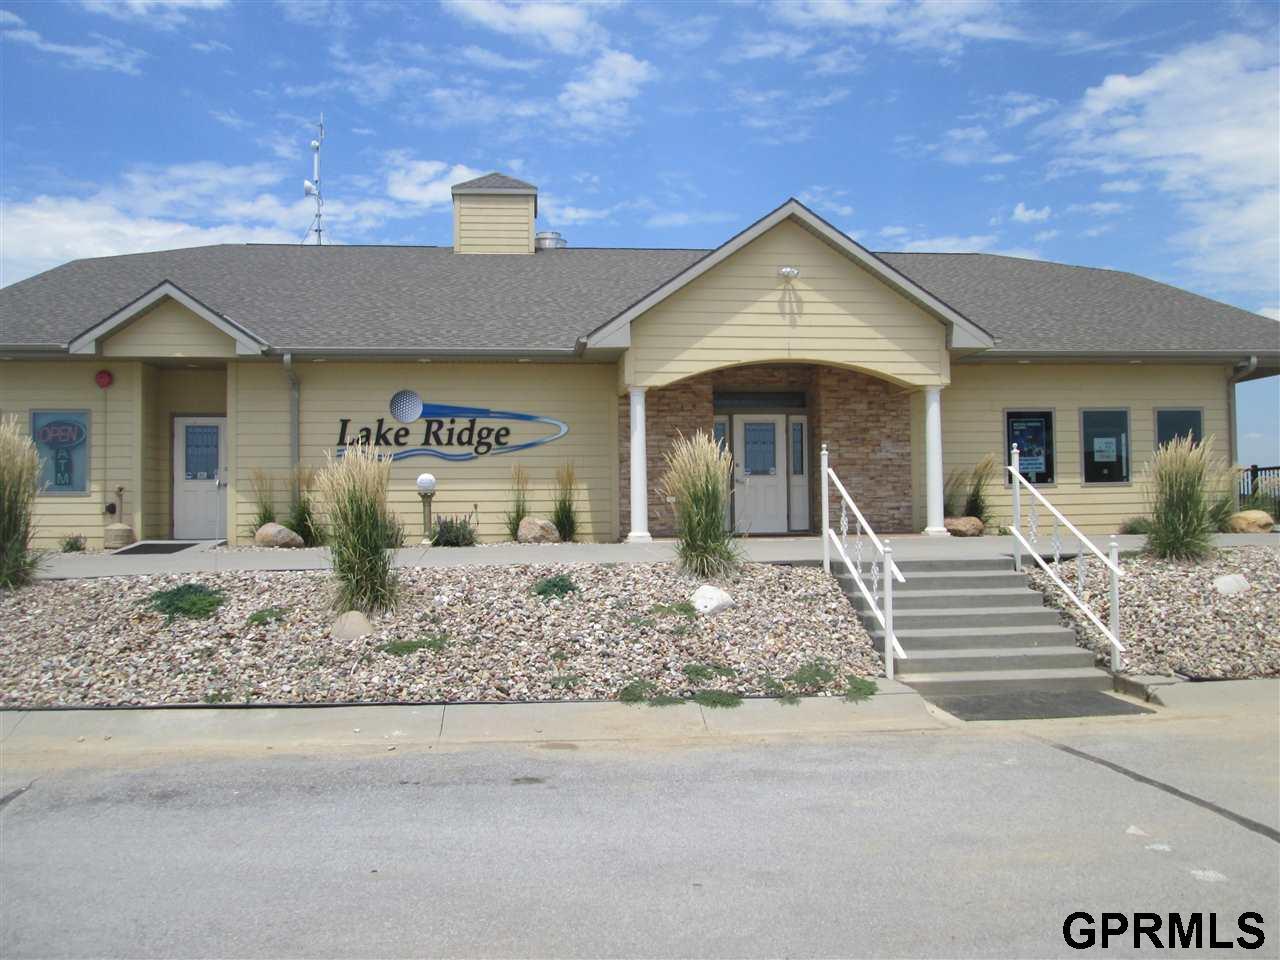 8642 Lakeridge Drive - Photo 1